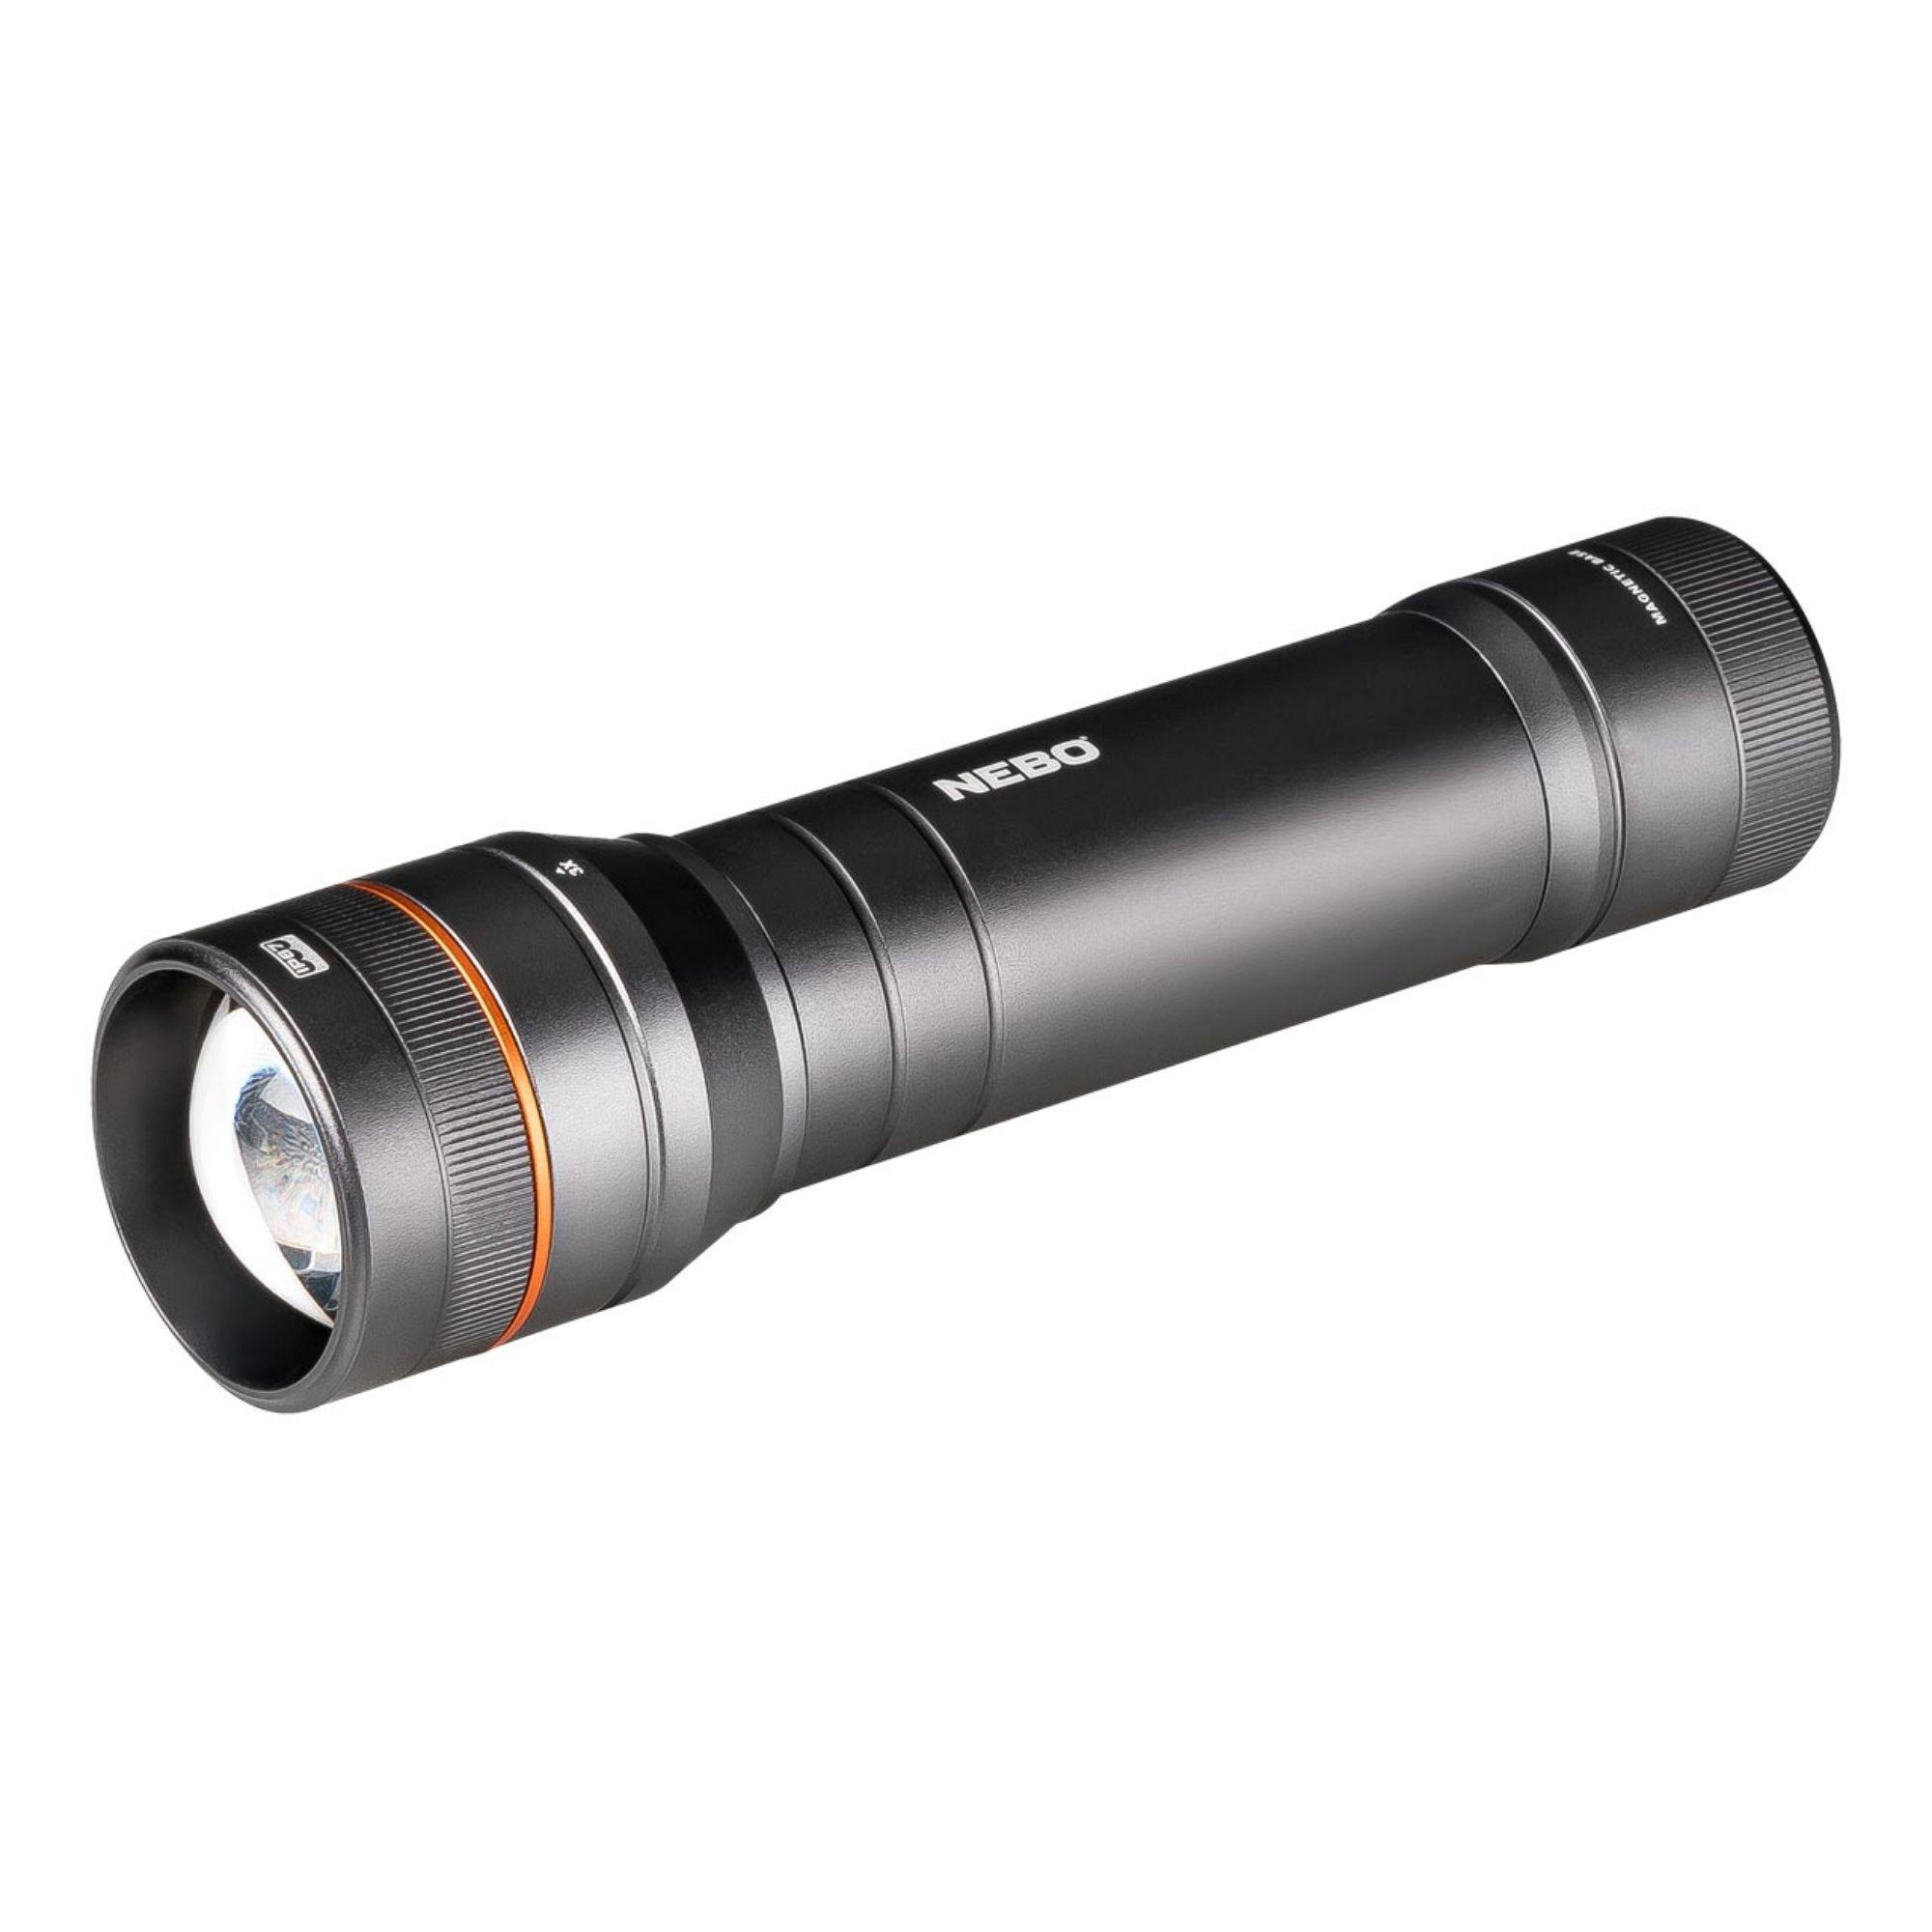 NEBO LED Taschenlampe NEWTON 1000